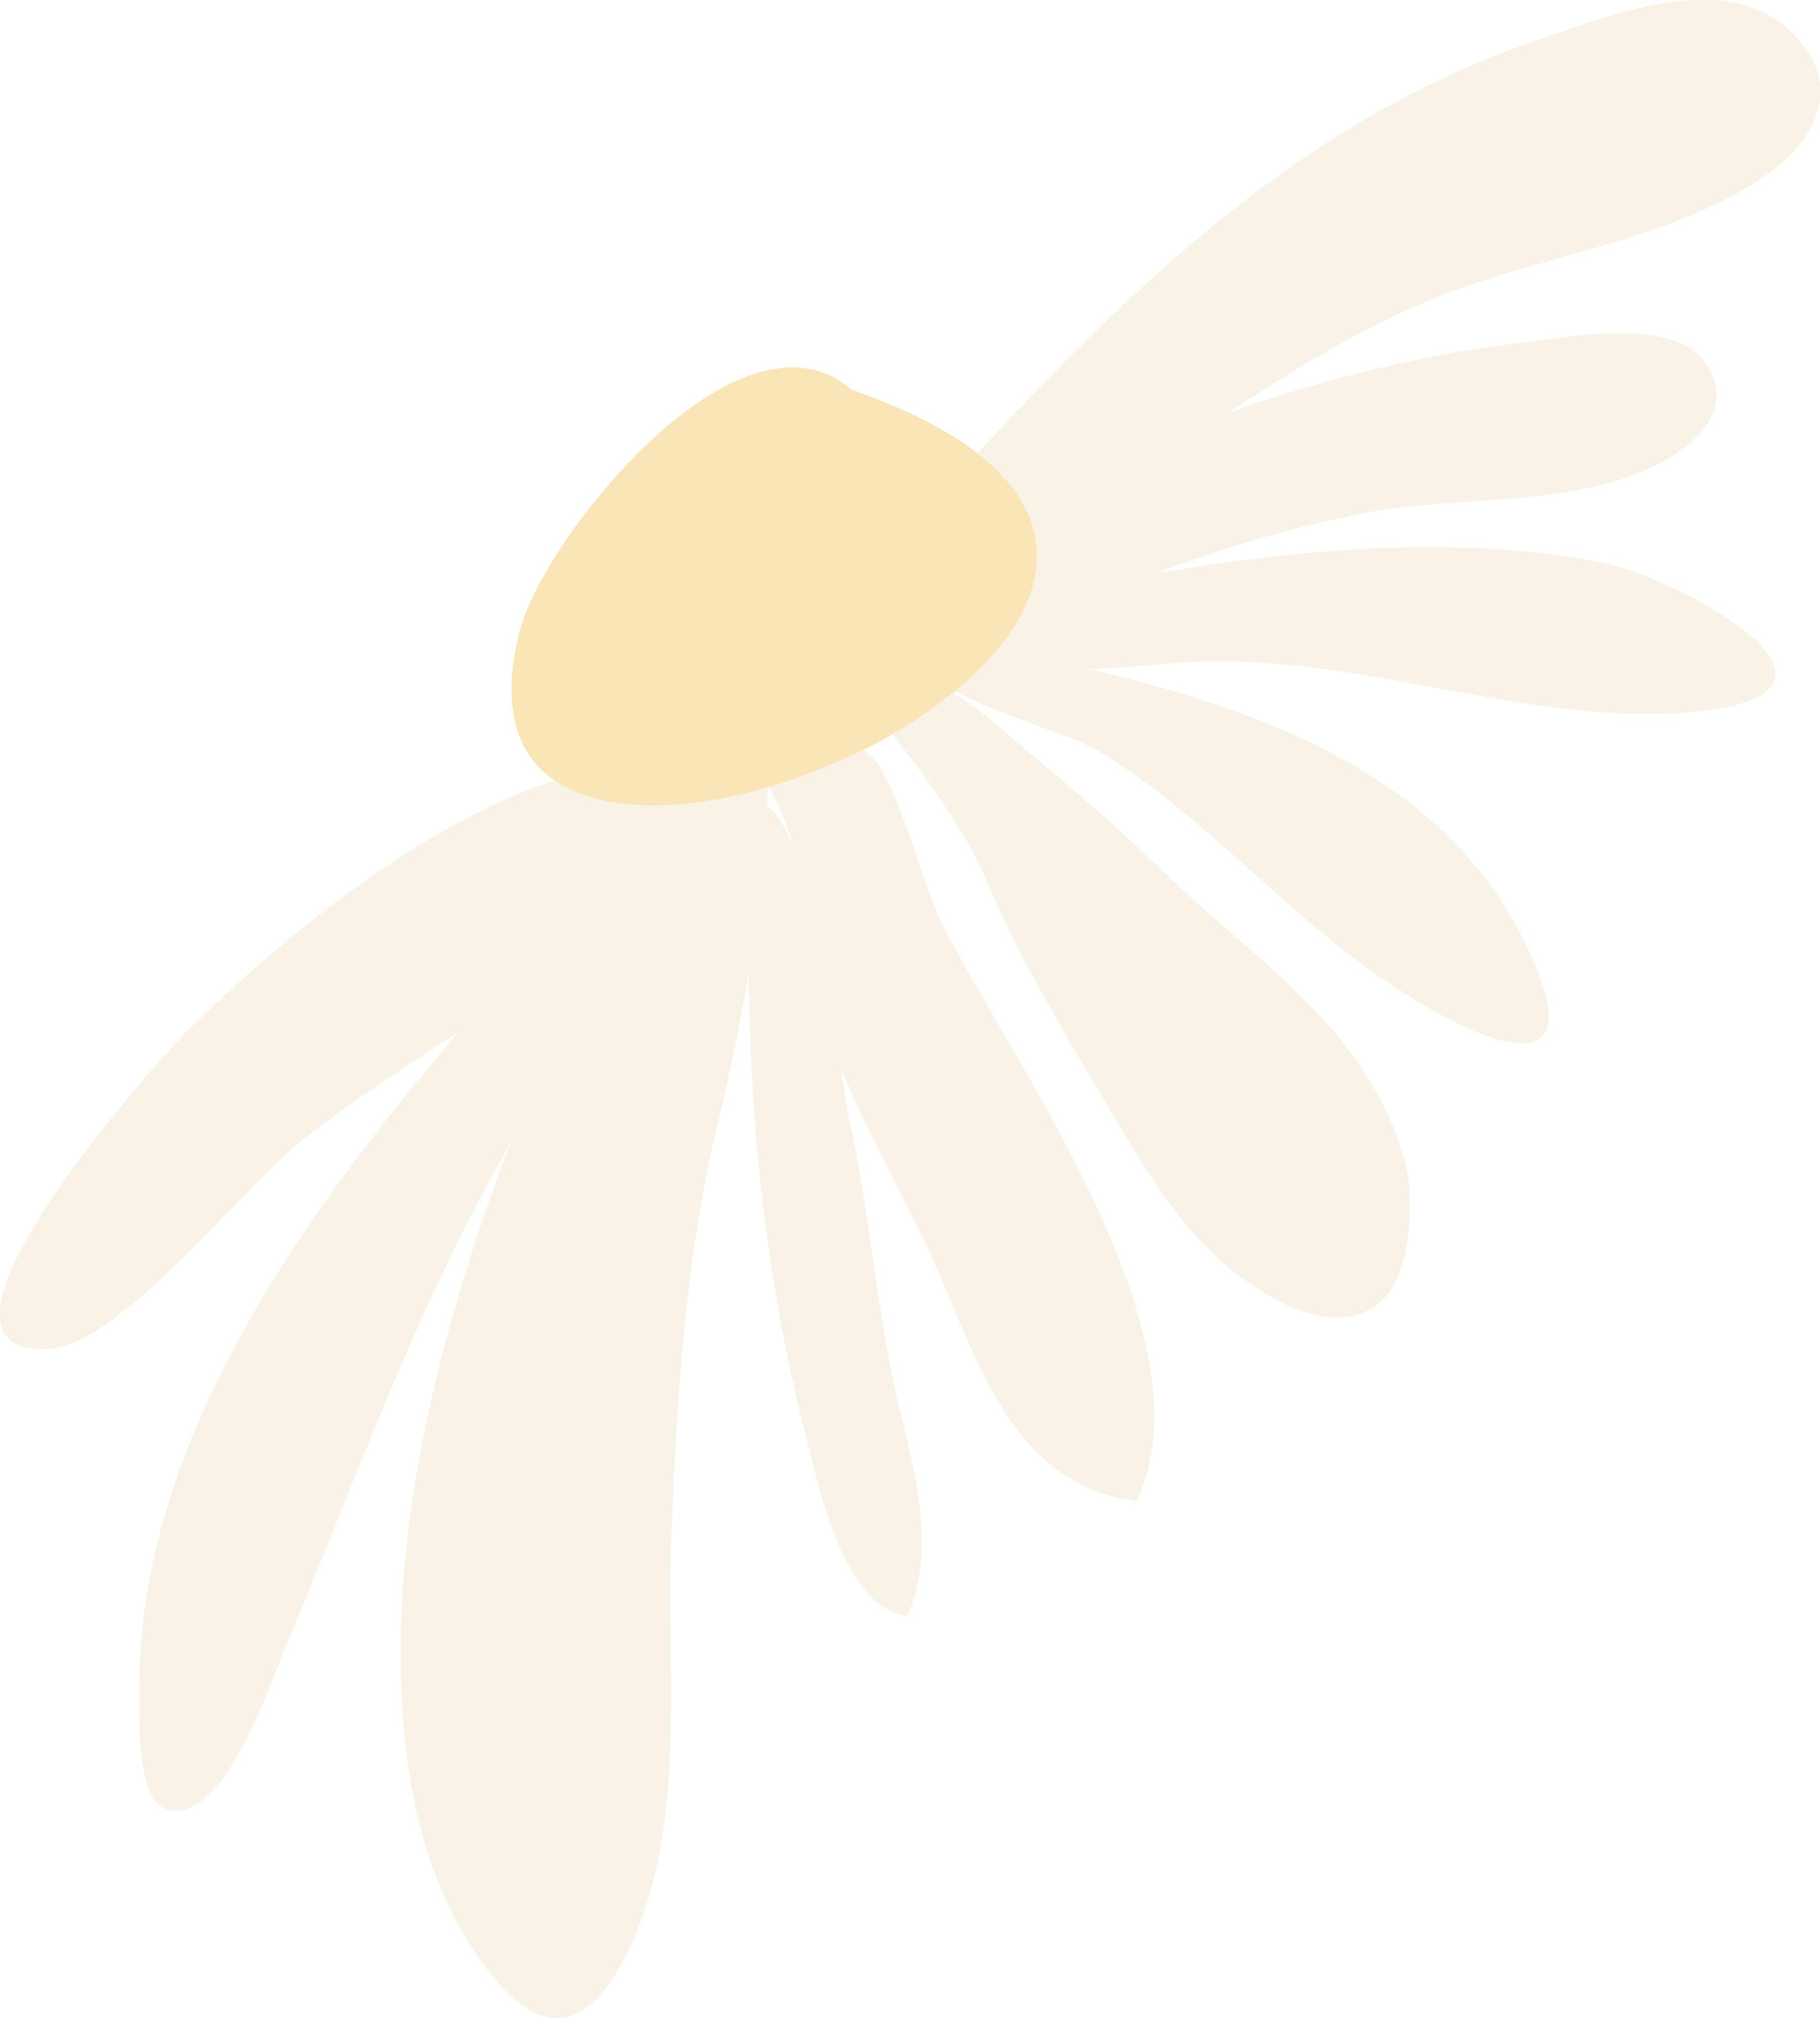 Dagelijkse Gedachte bloem